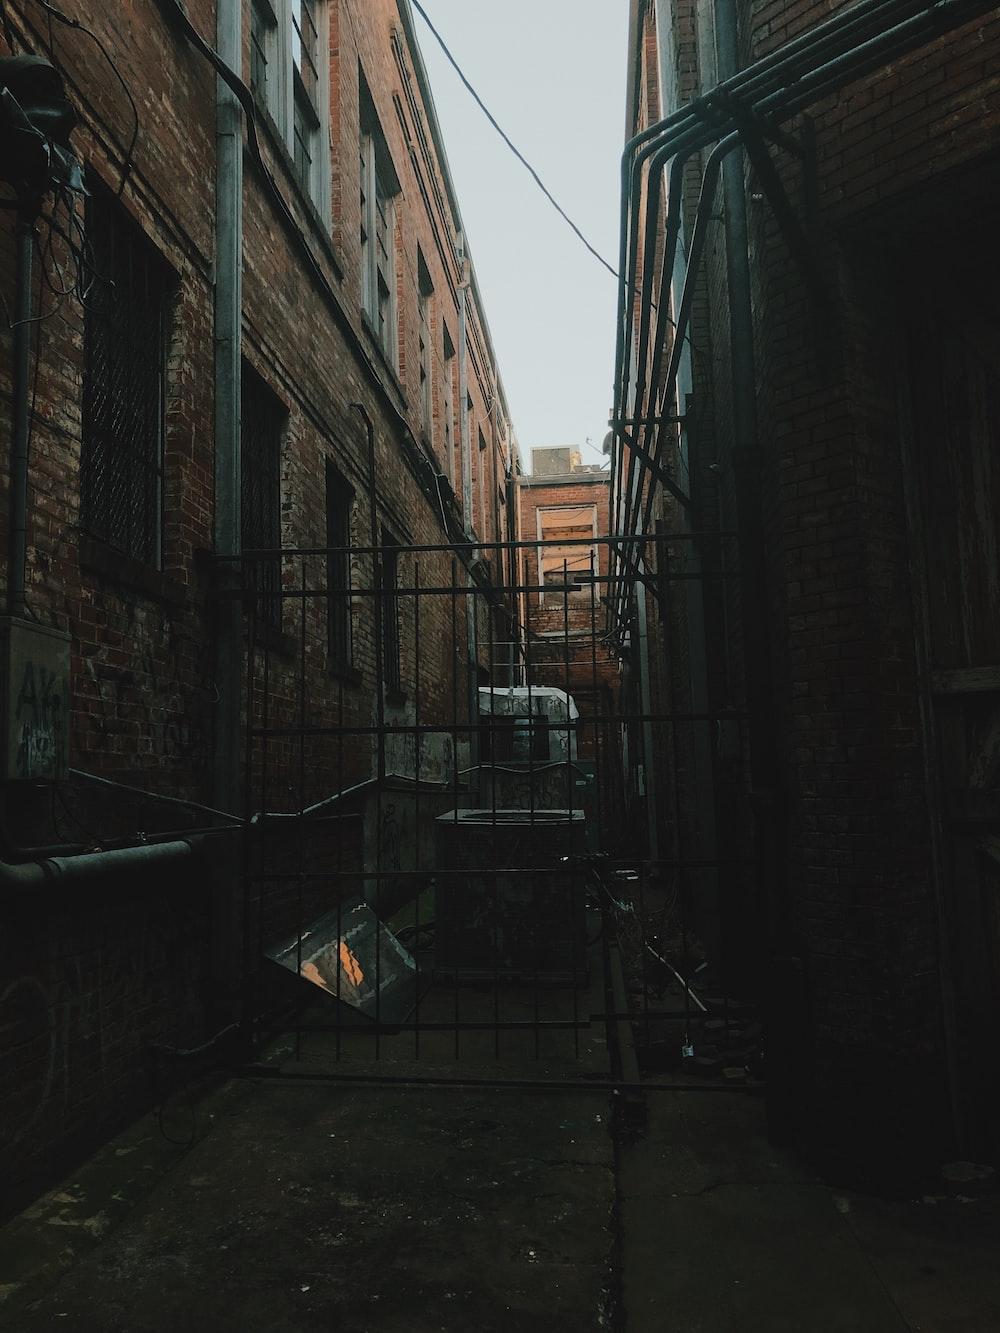 brown brick building during daytime